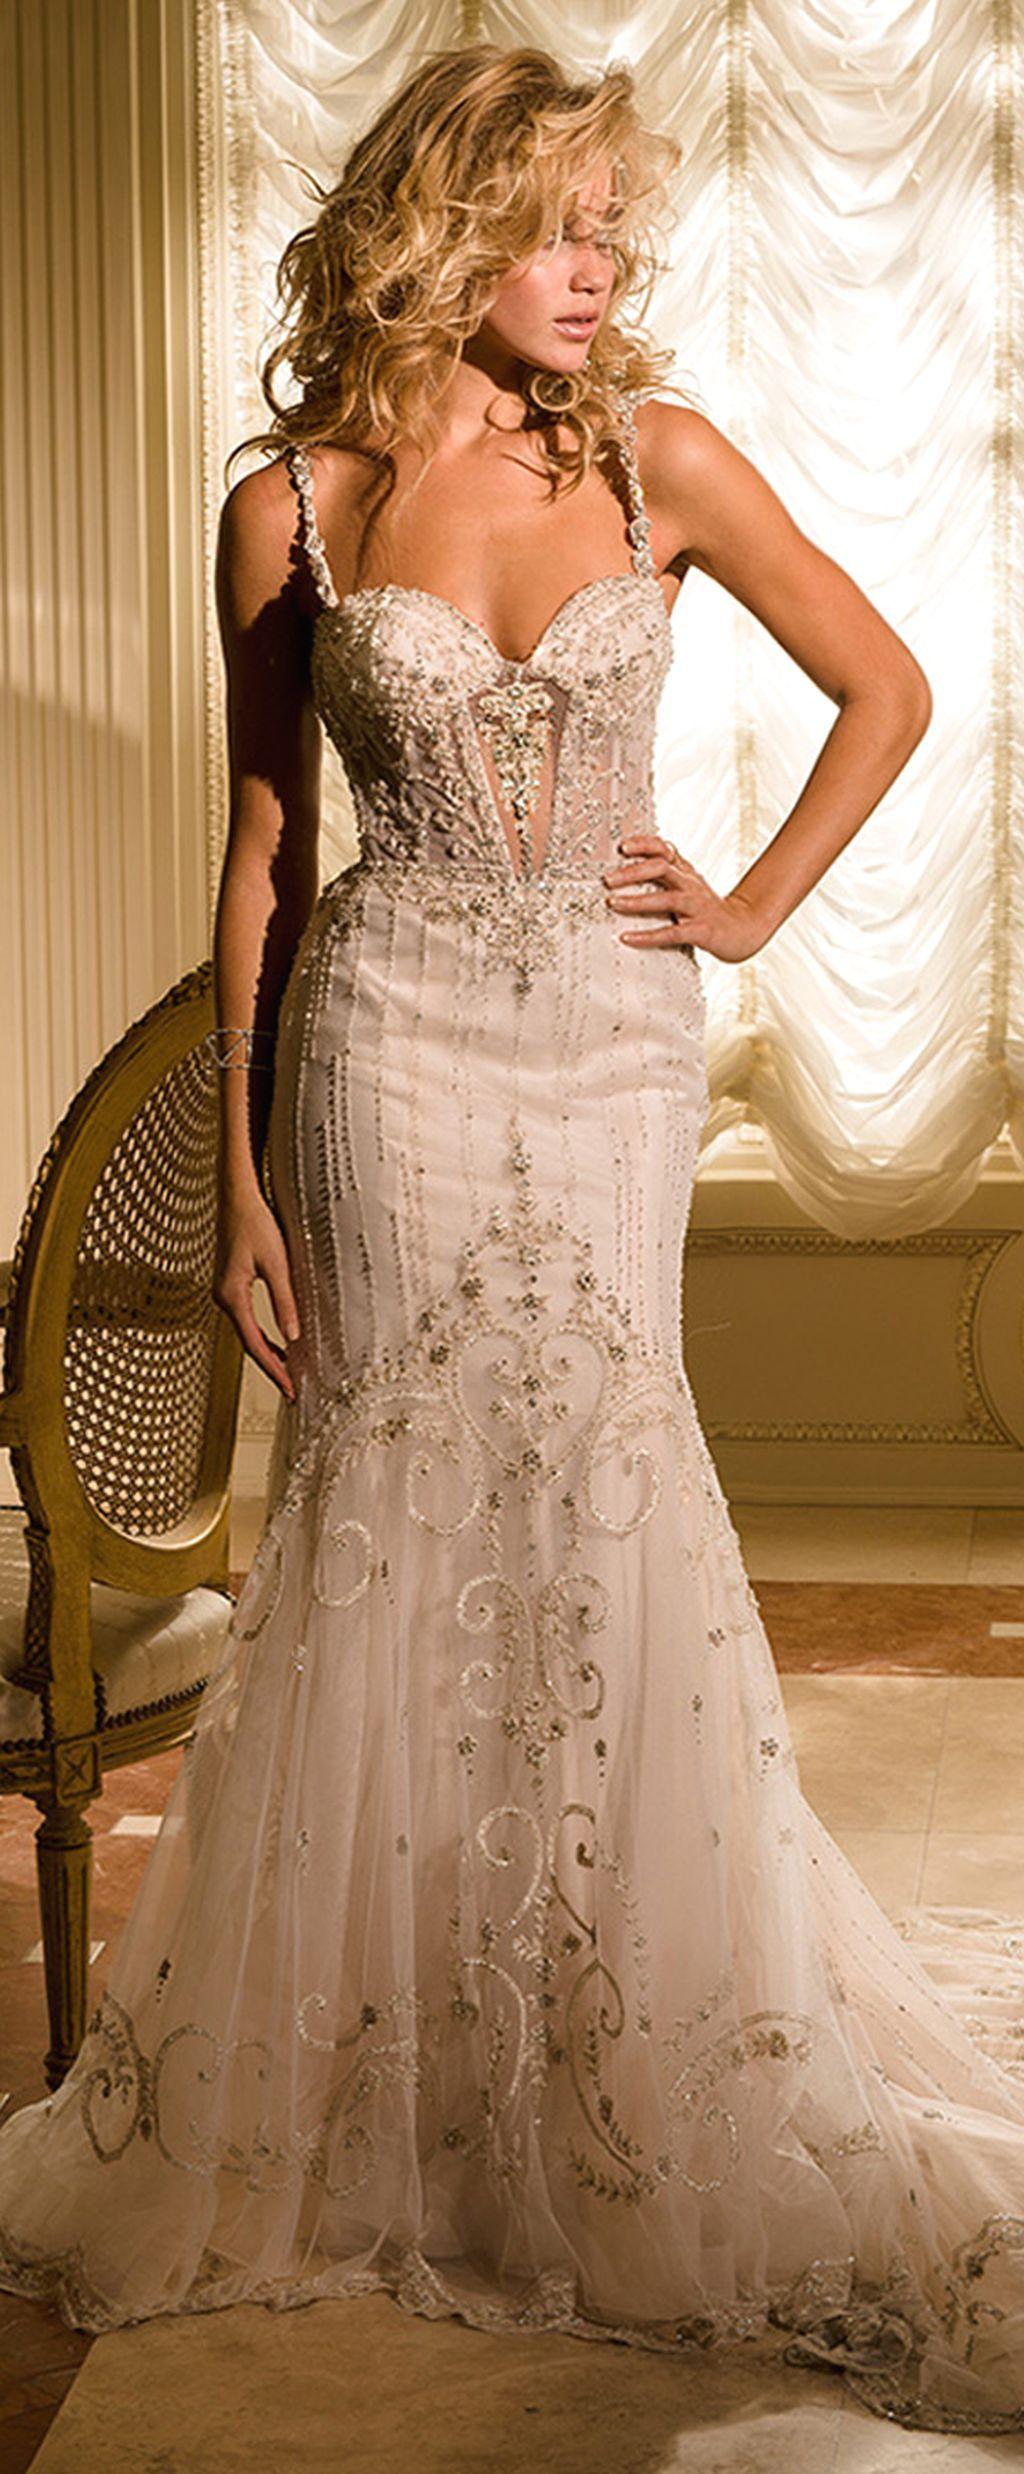 beautiful princess mermaid wedding dress ideas mermaid wedding